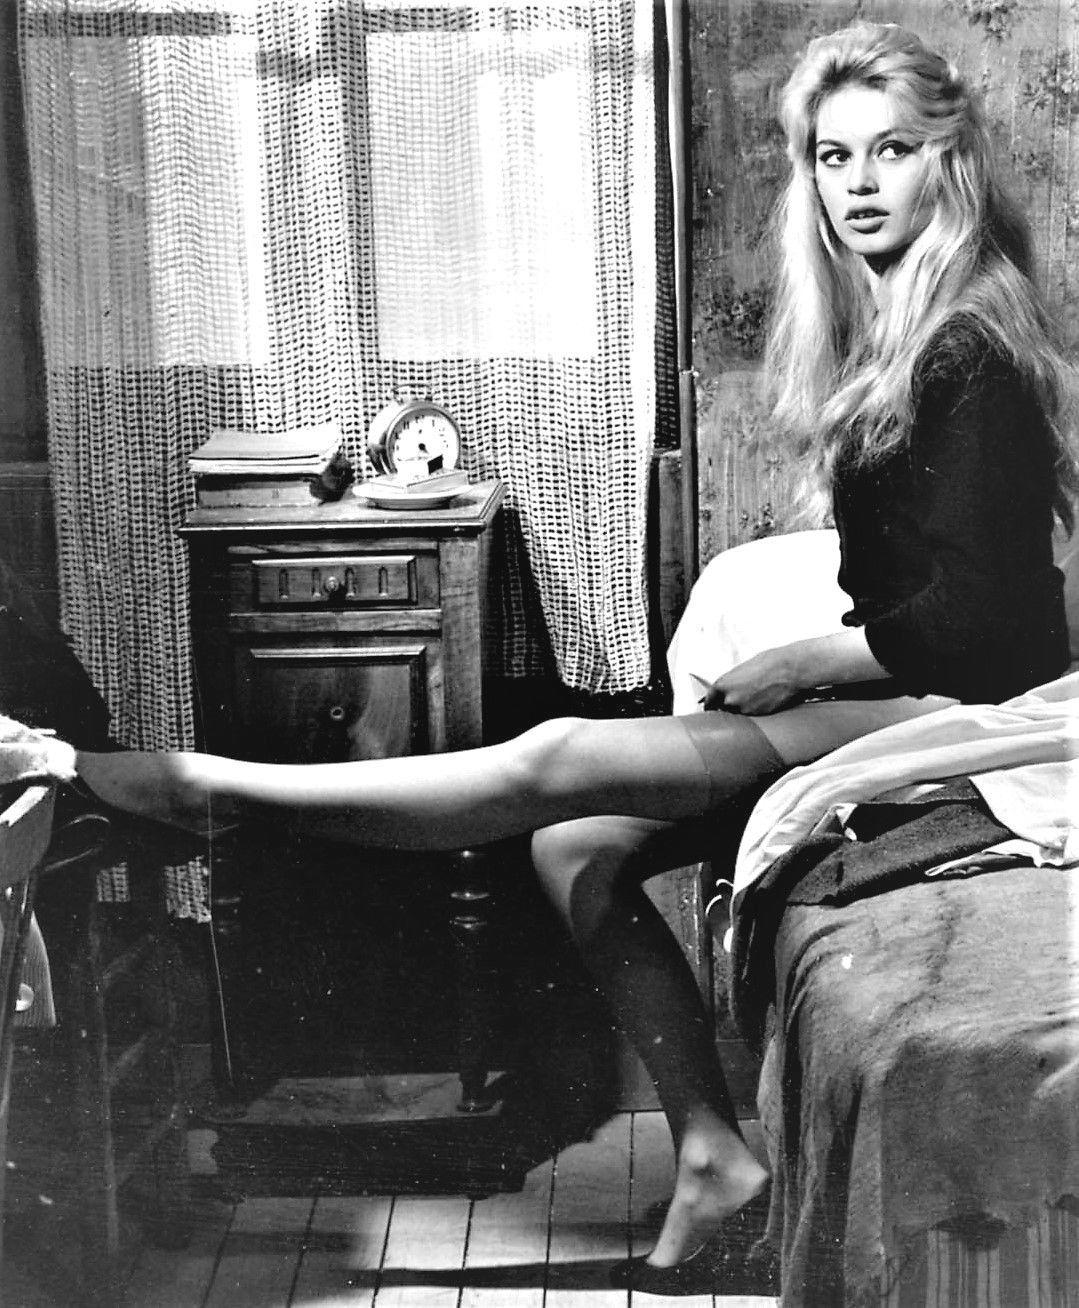 calvin klein shoes brigitte bardot movies 1957